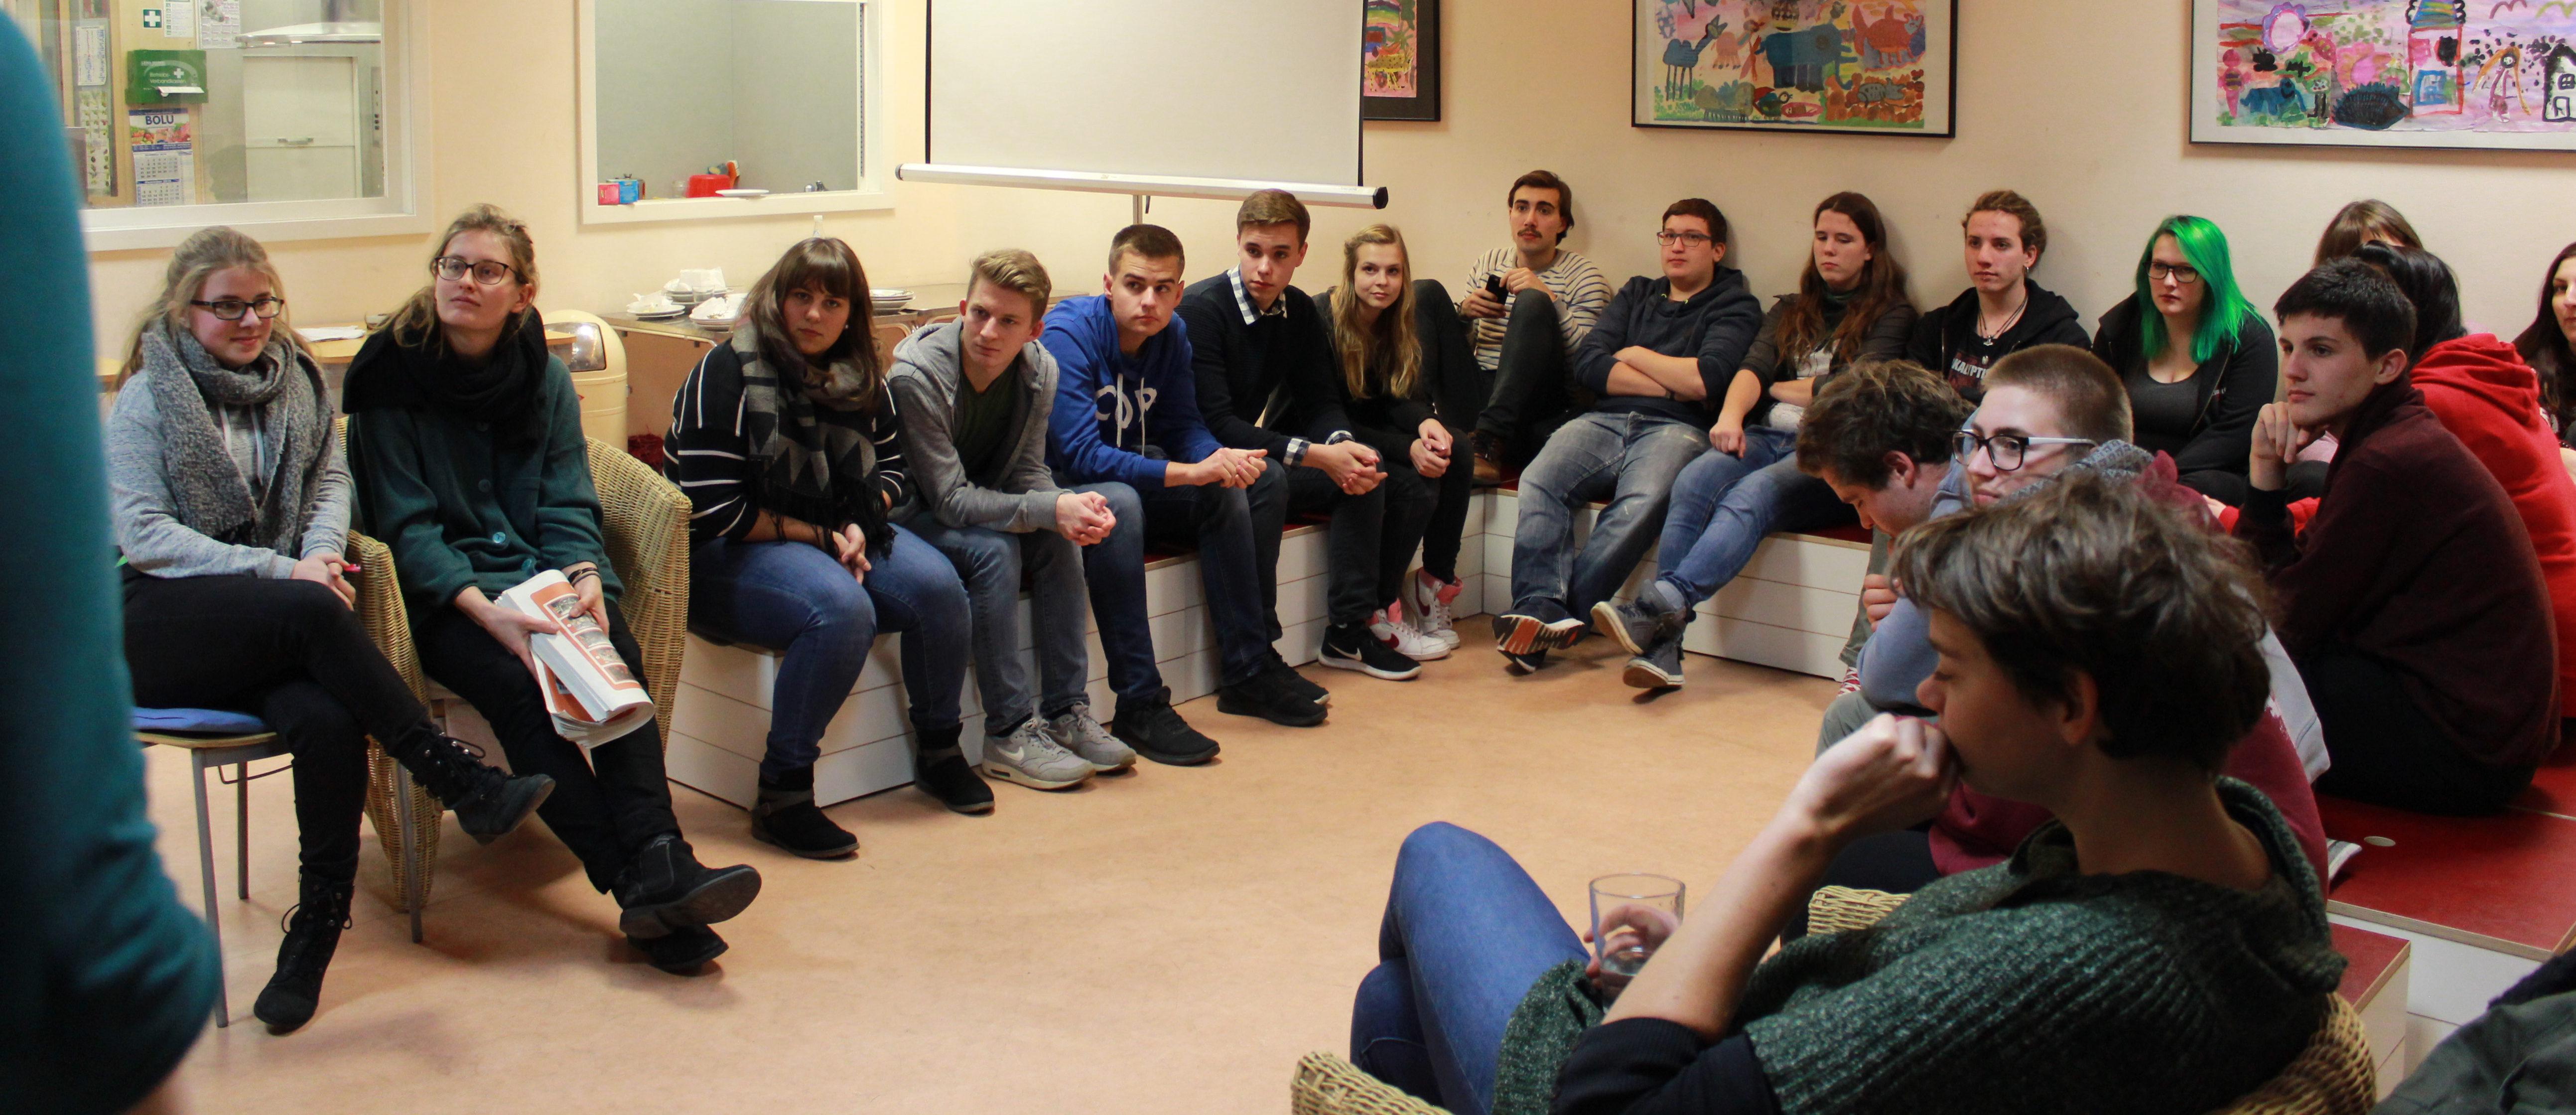 Teilnehmende des 10. Jugendforums Stadtentwicklung